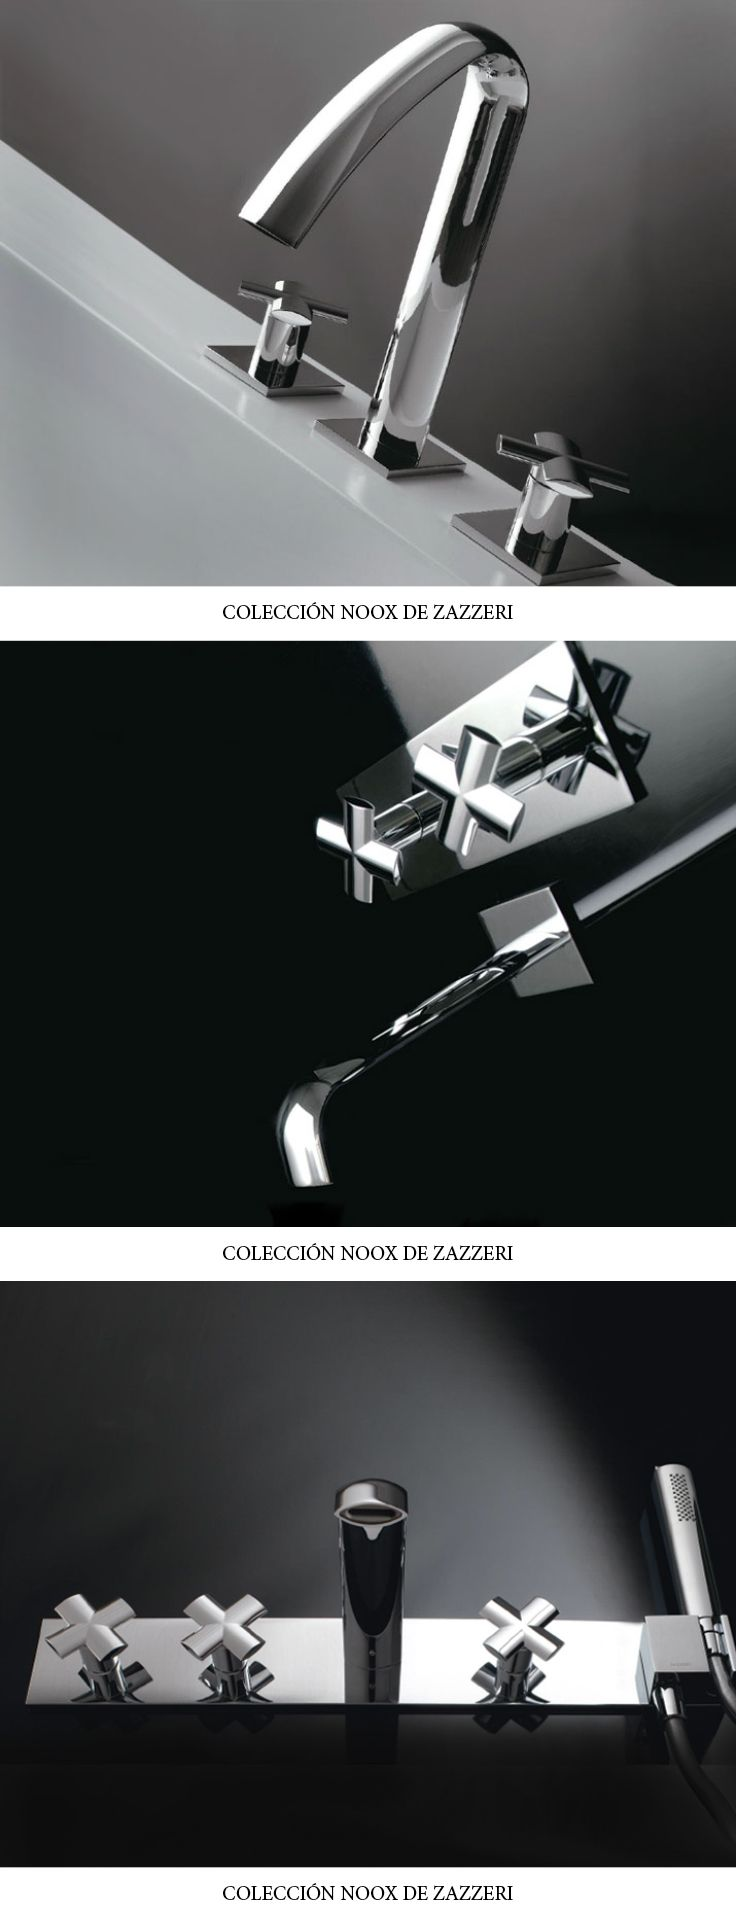 Colección Noox de Zazzeri. #griferia #zazzeri #inardi #design